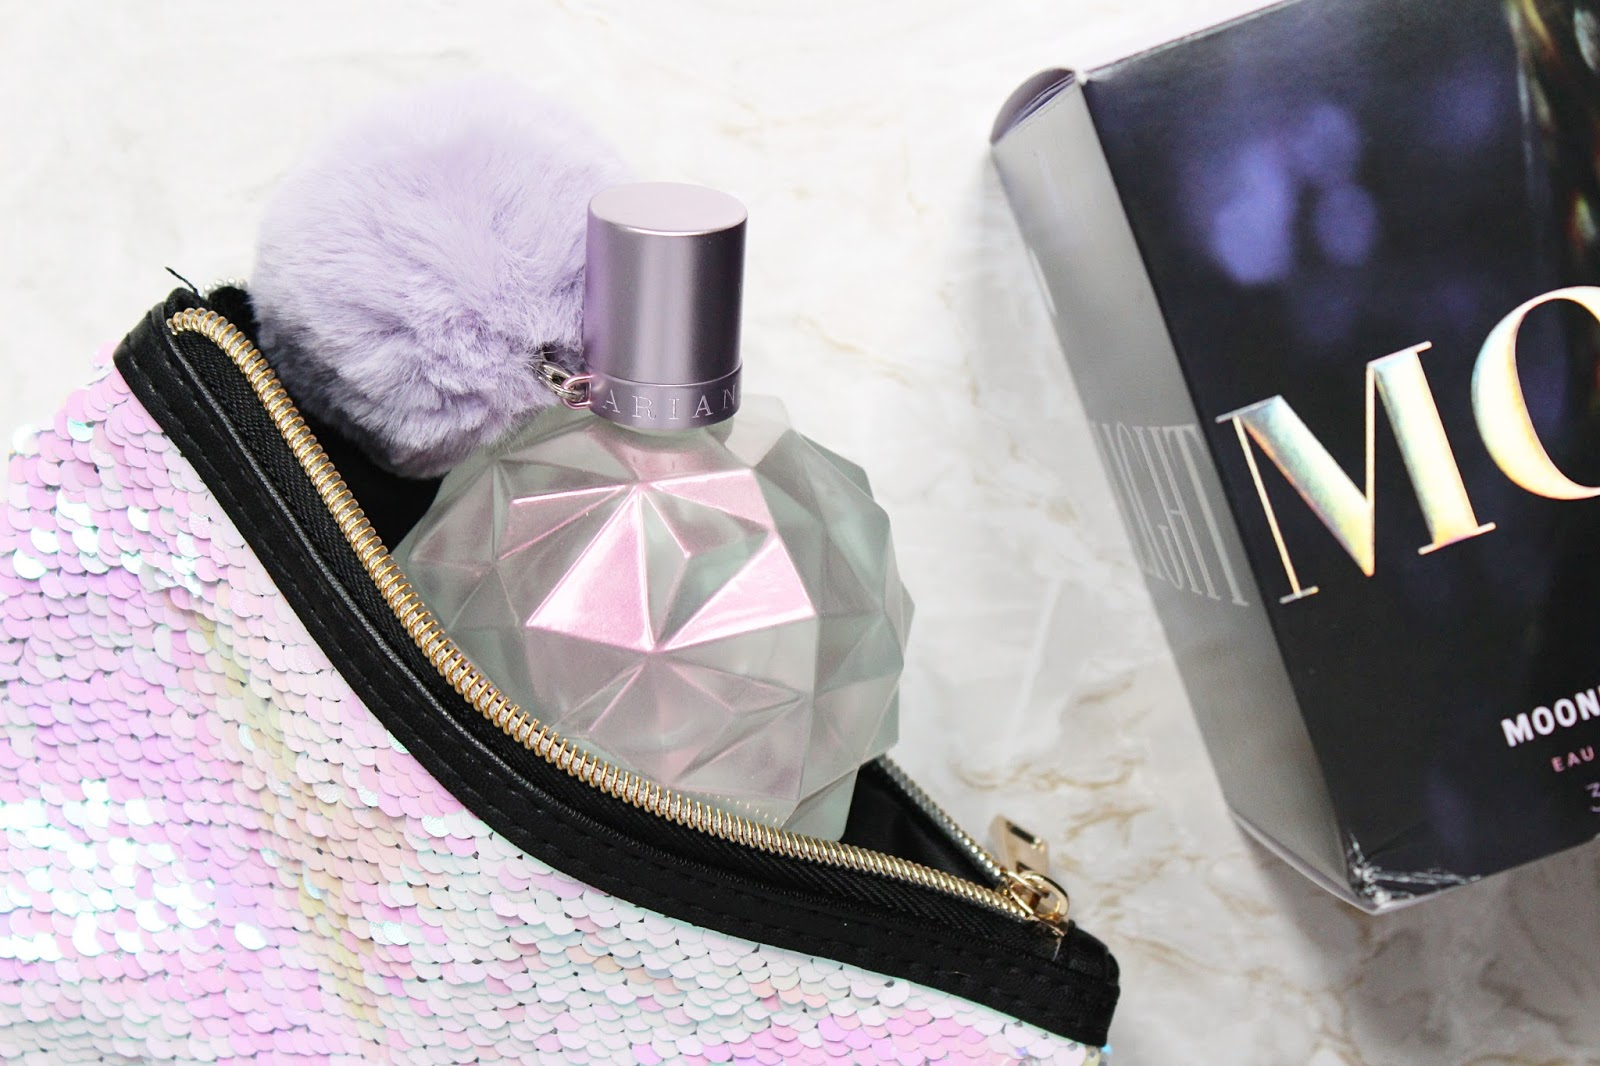 Ariana Grande Moonlight Perfume